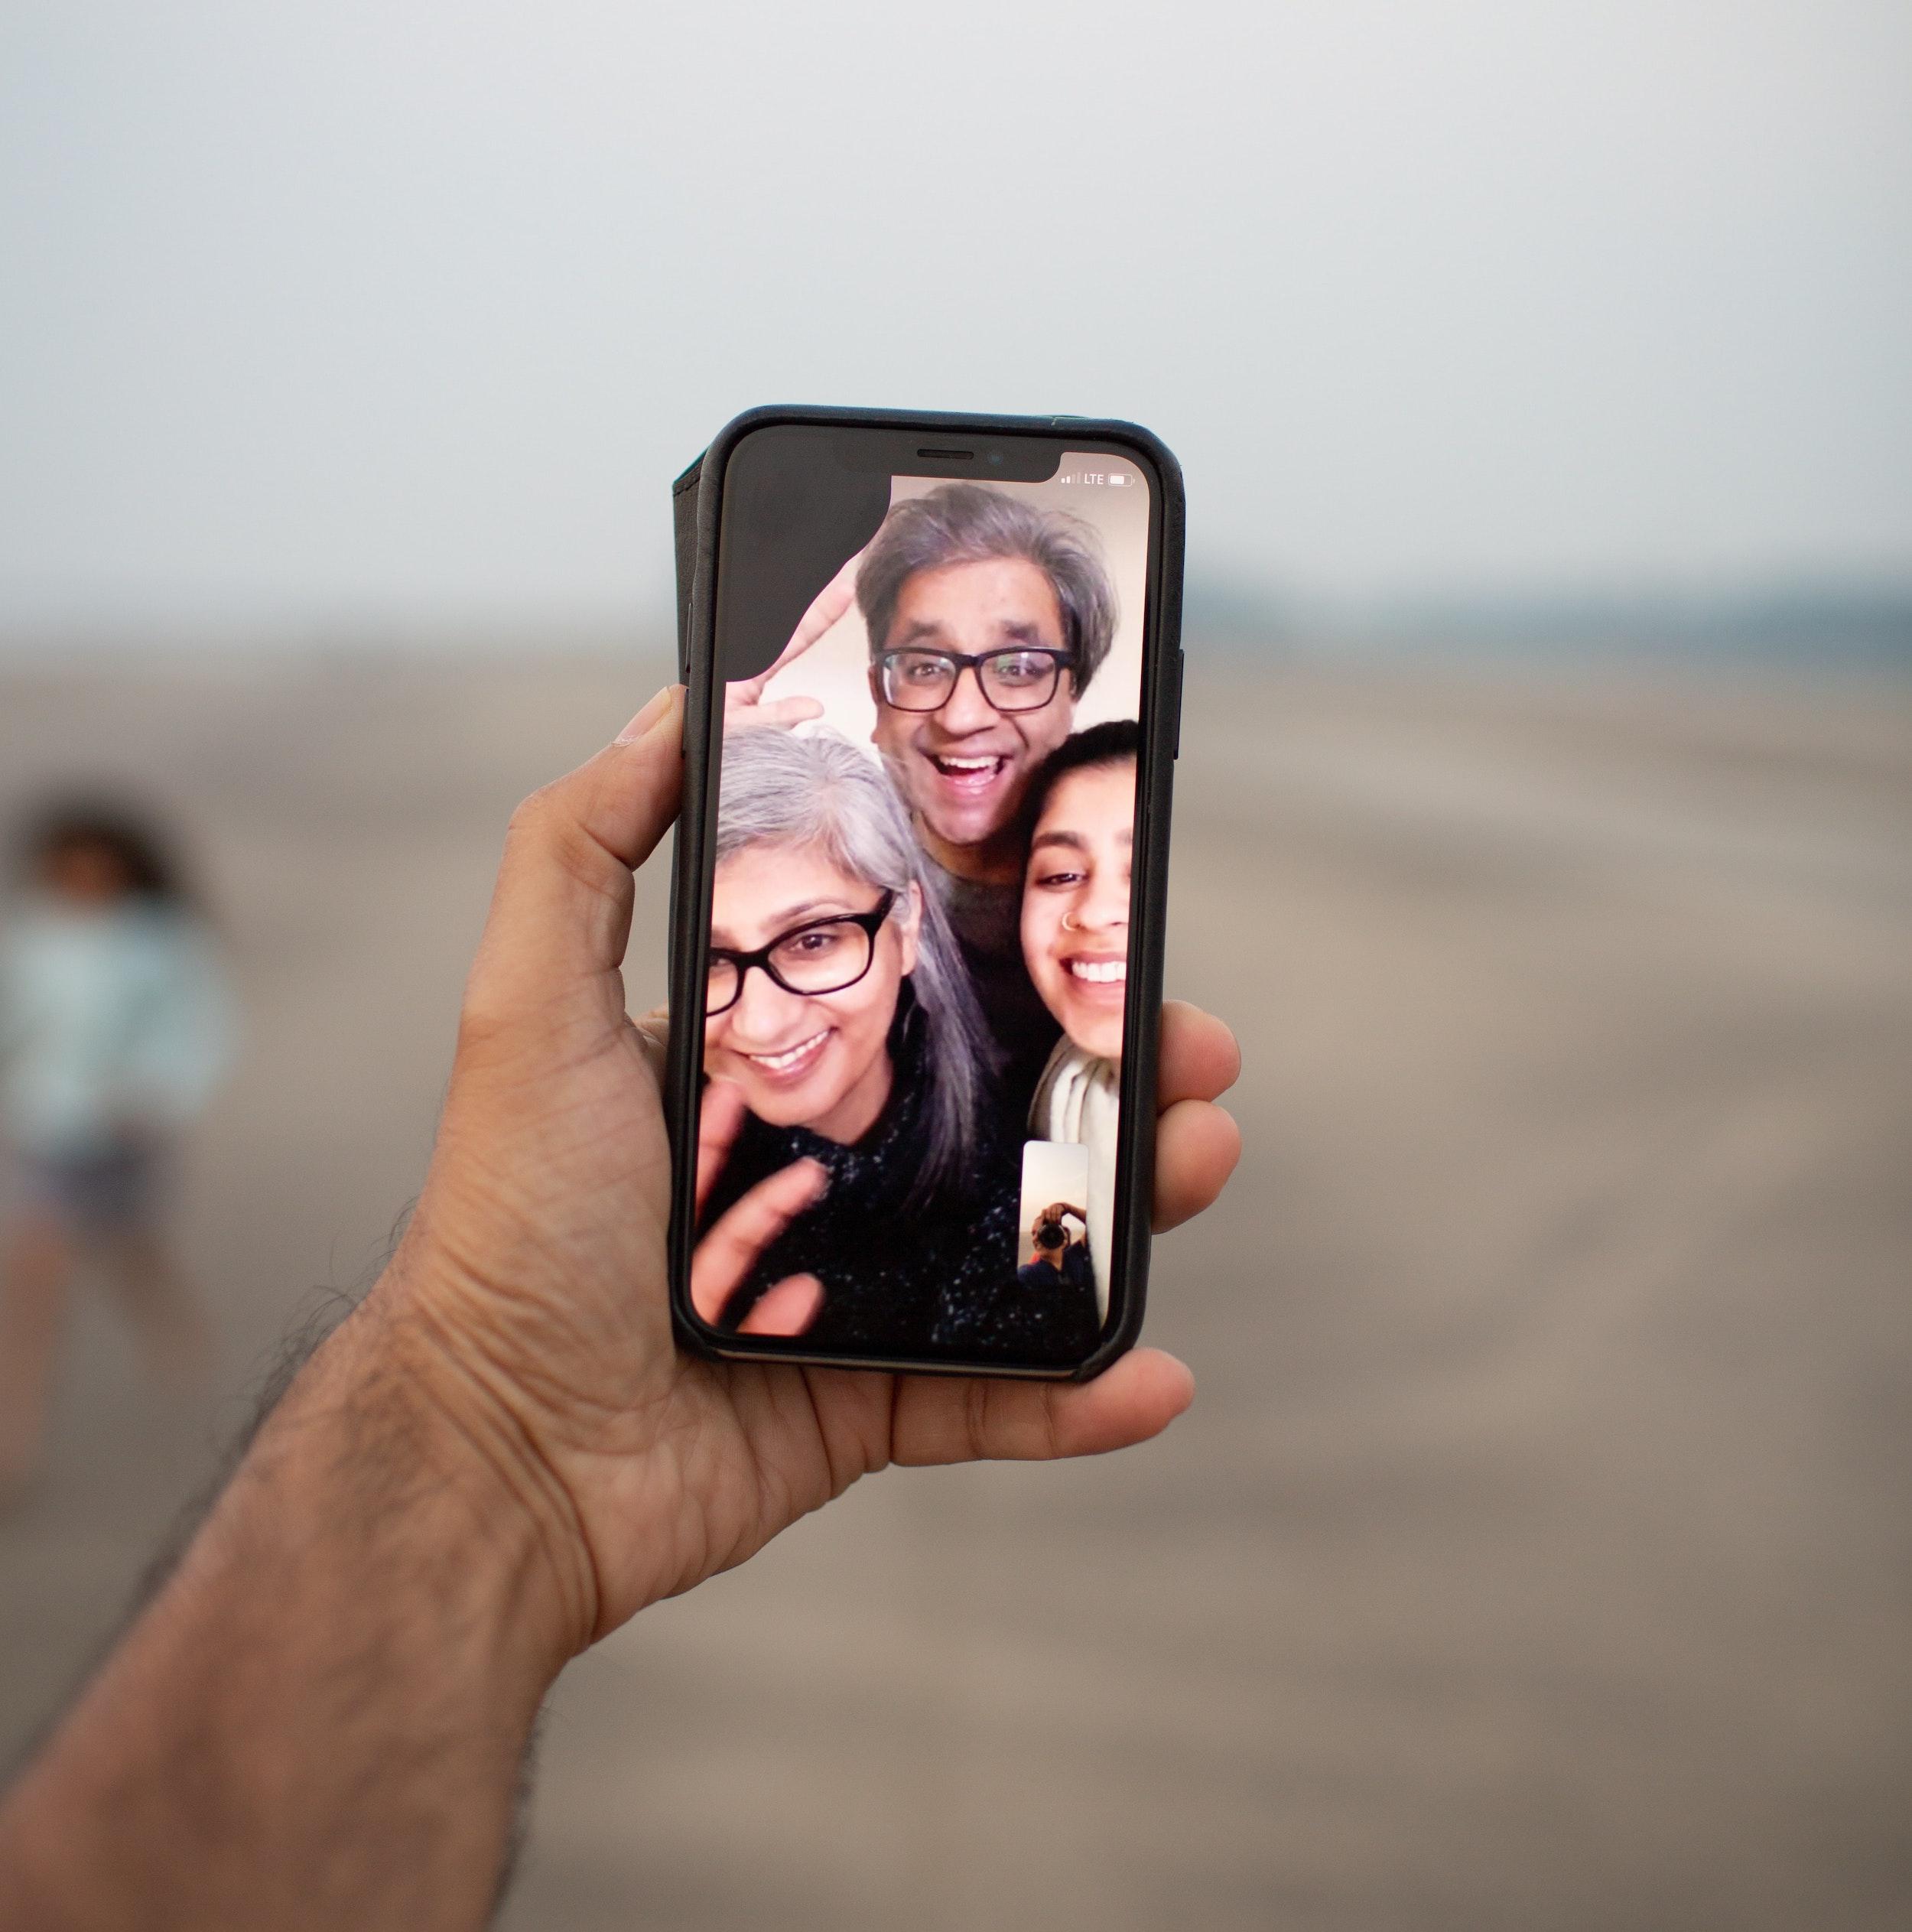 Social gathering via Facetime on phone